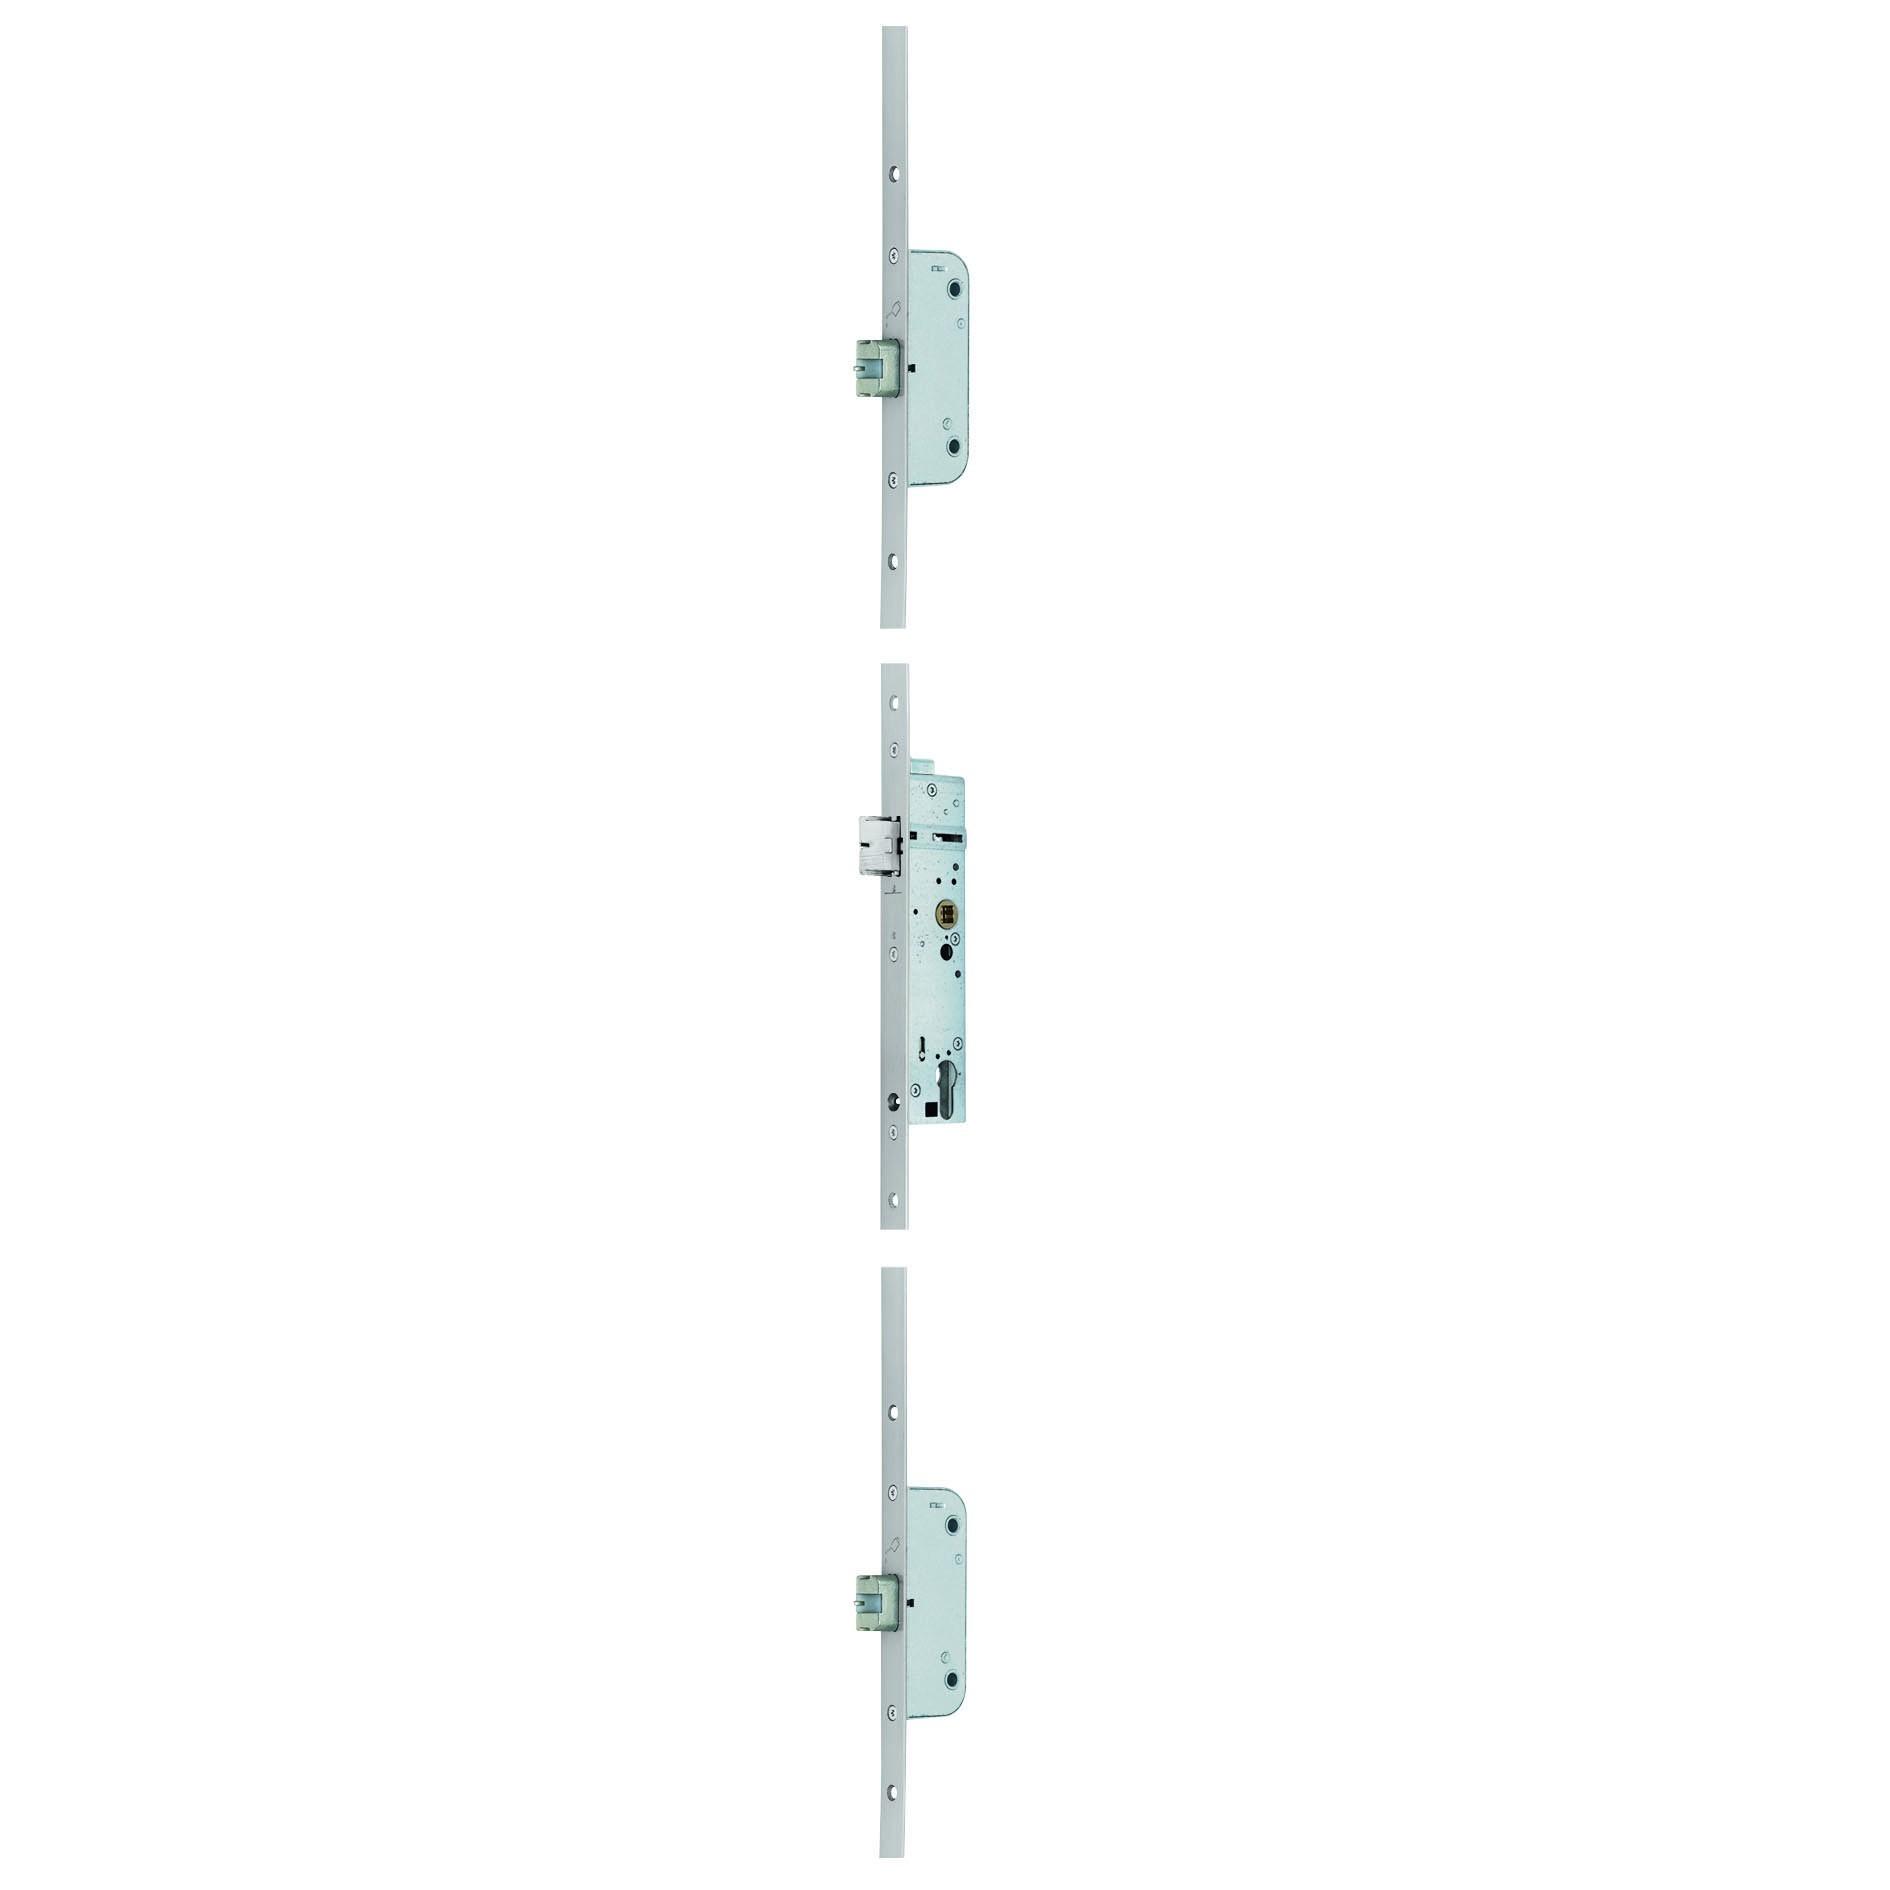 BKS- Panik Mehrfachverriegelung Secury 1910 / 92 / 35 / 9 / F24x2285x3mm / F-B / Edelstahl / DIN: Links / EN179 + EN1125 / 1-flg.